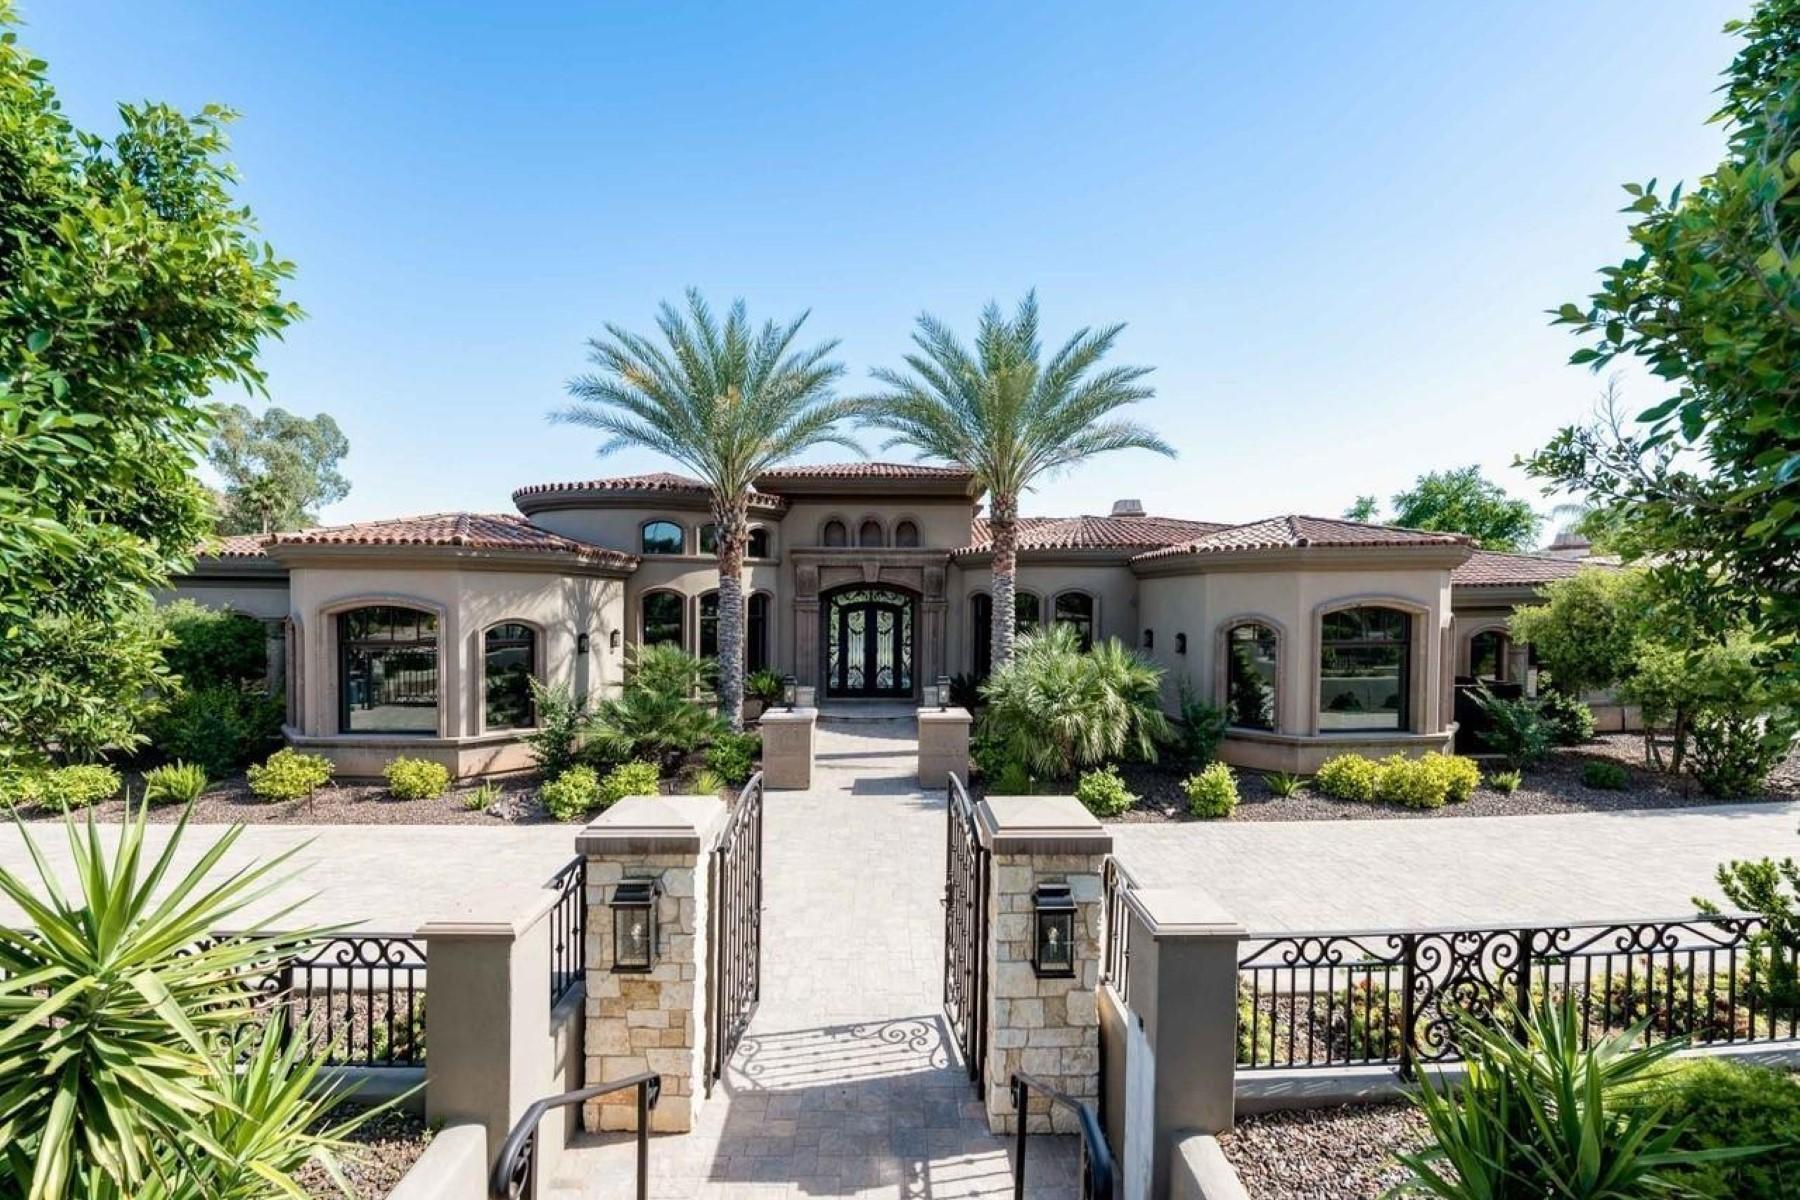 Single Family Homes για την Πώληση στο Paradise Hills 4825 E ROADRUNNER RD N, Paradise Valley, Αριζονα 85253 Ηνωμένες Πολιτείες